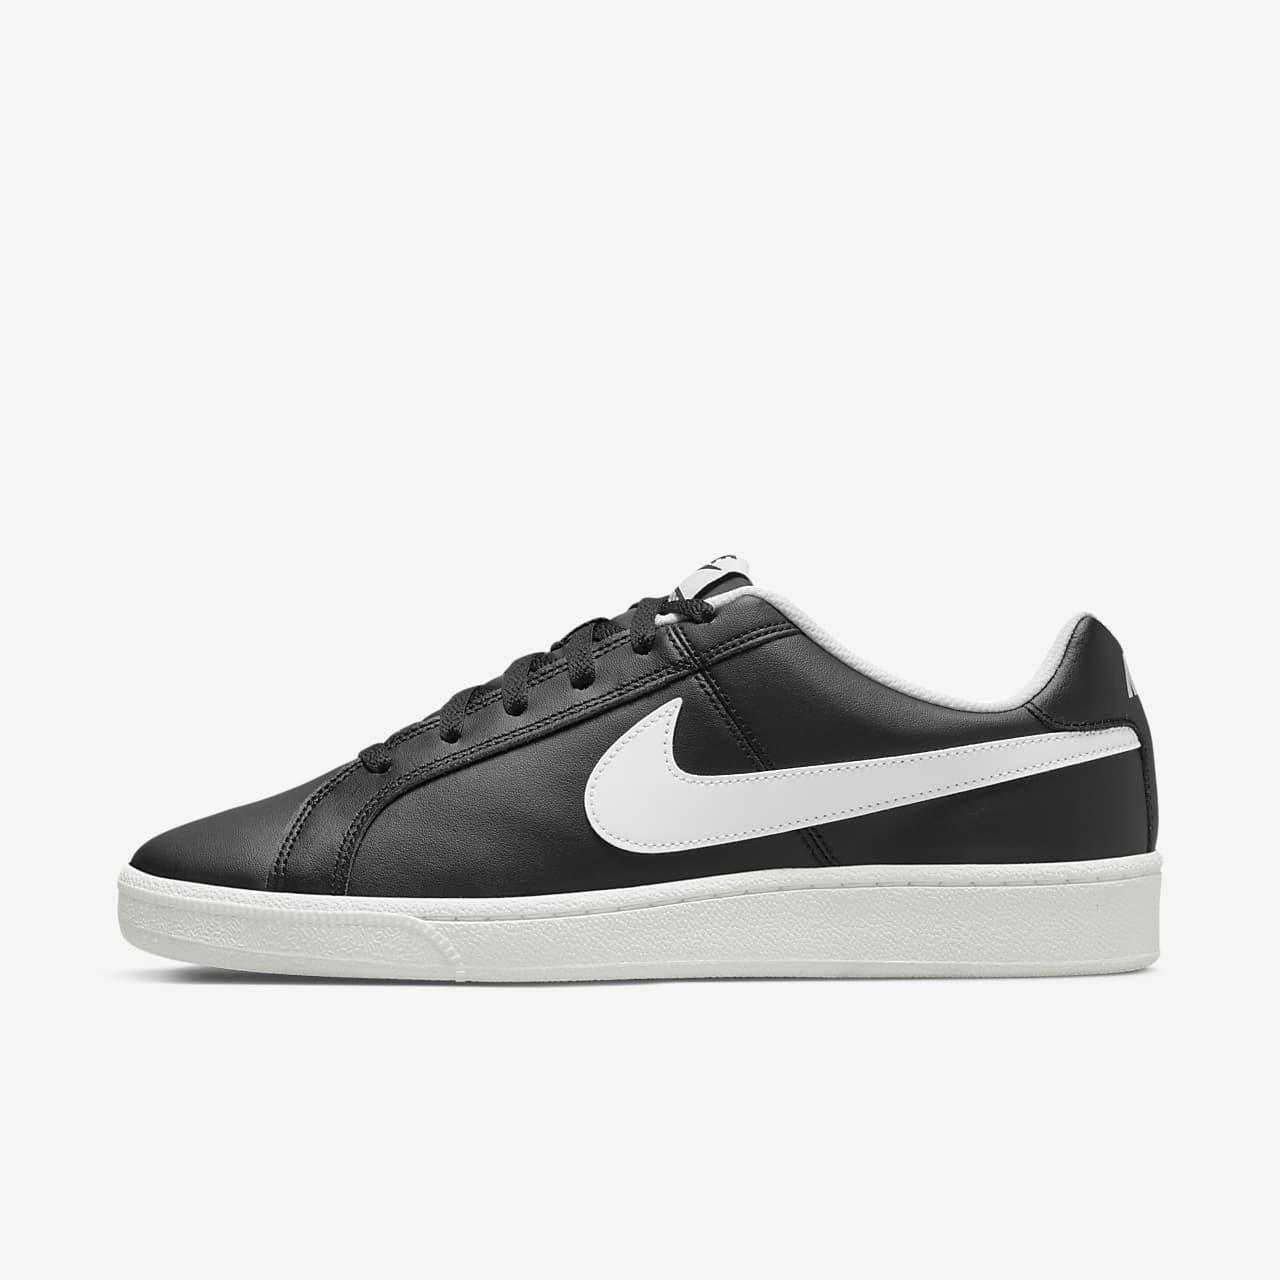 NikeCourt Royale Men's Shoe. Nike MA